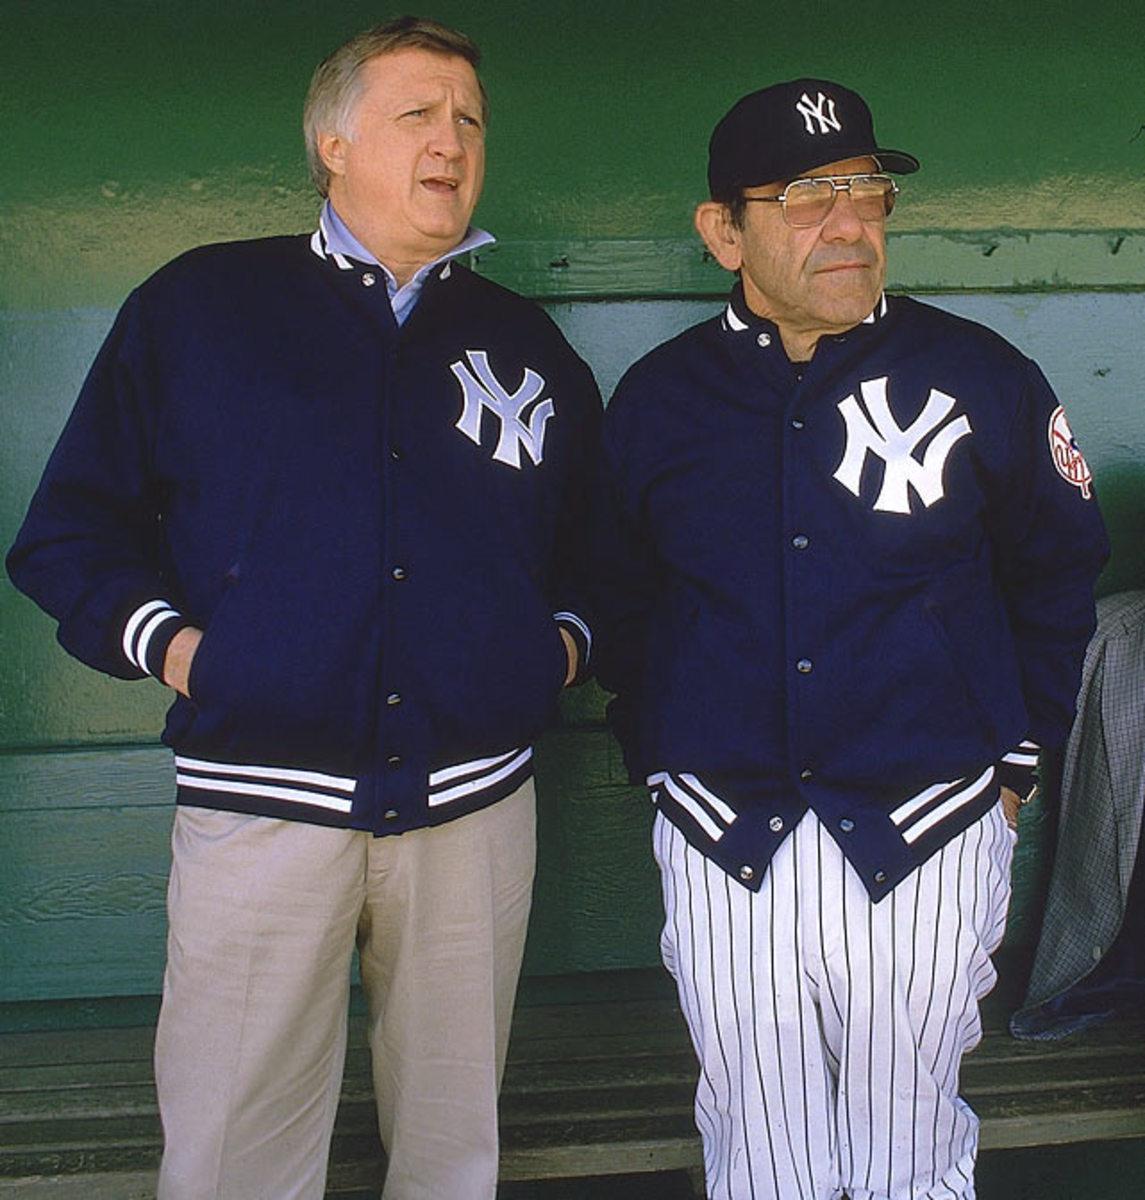 Yogi Berra and <br> George Steinbrenner